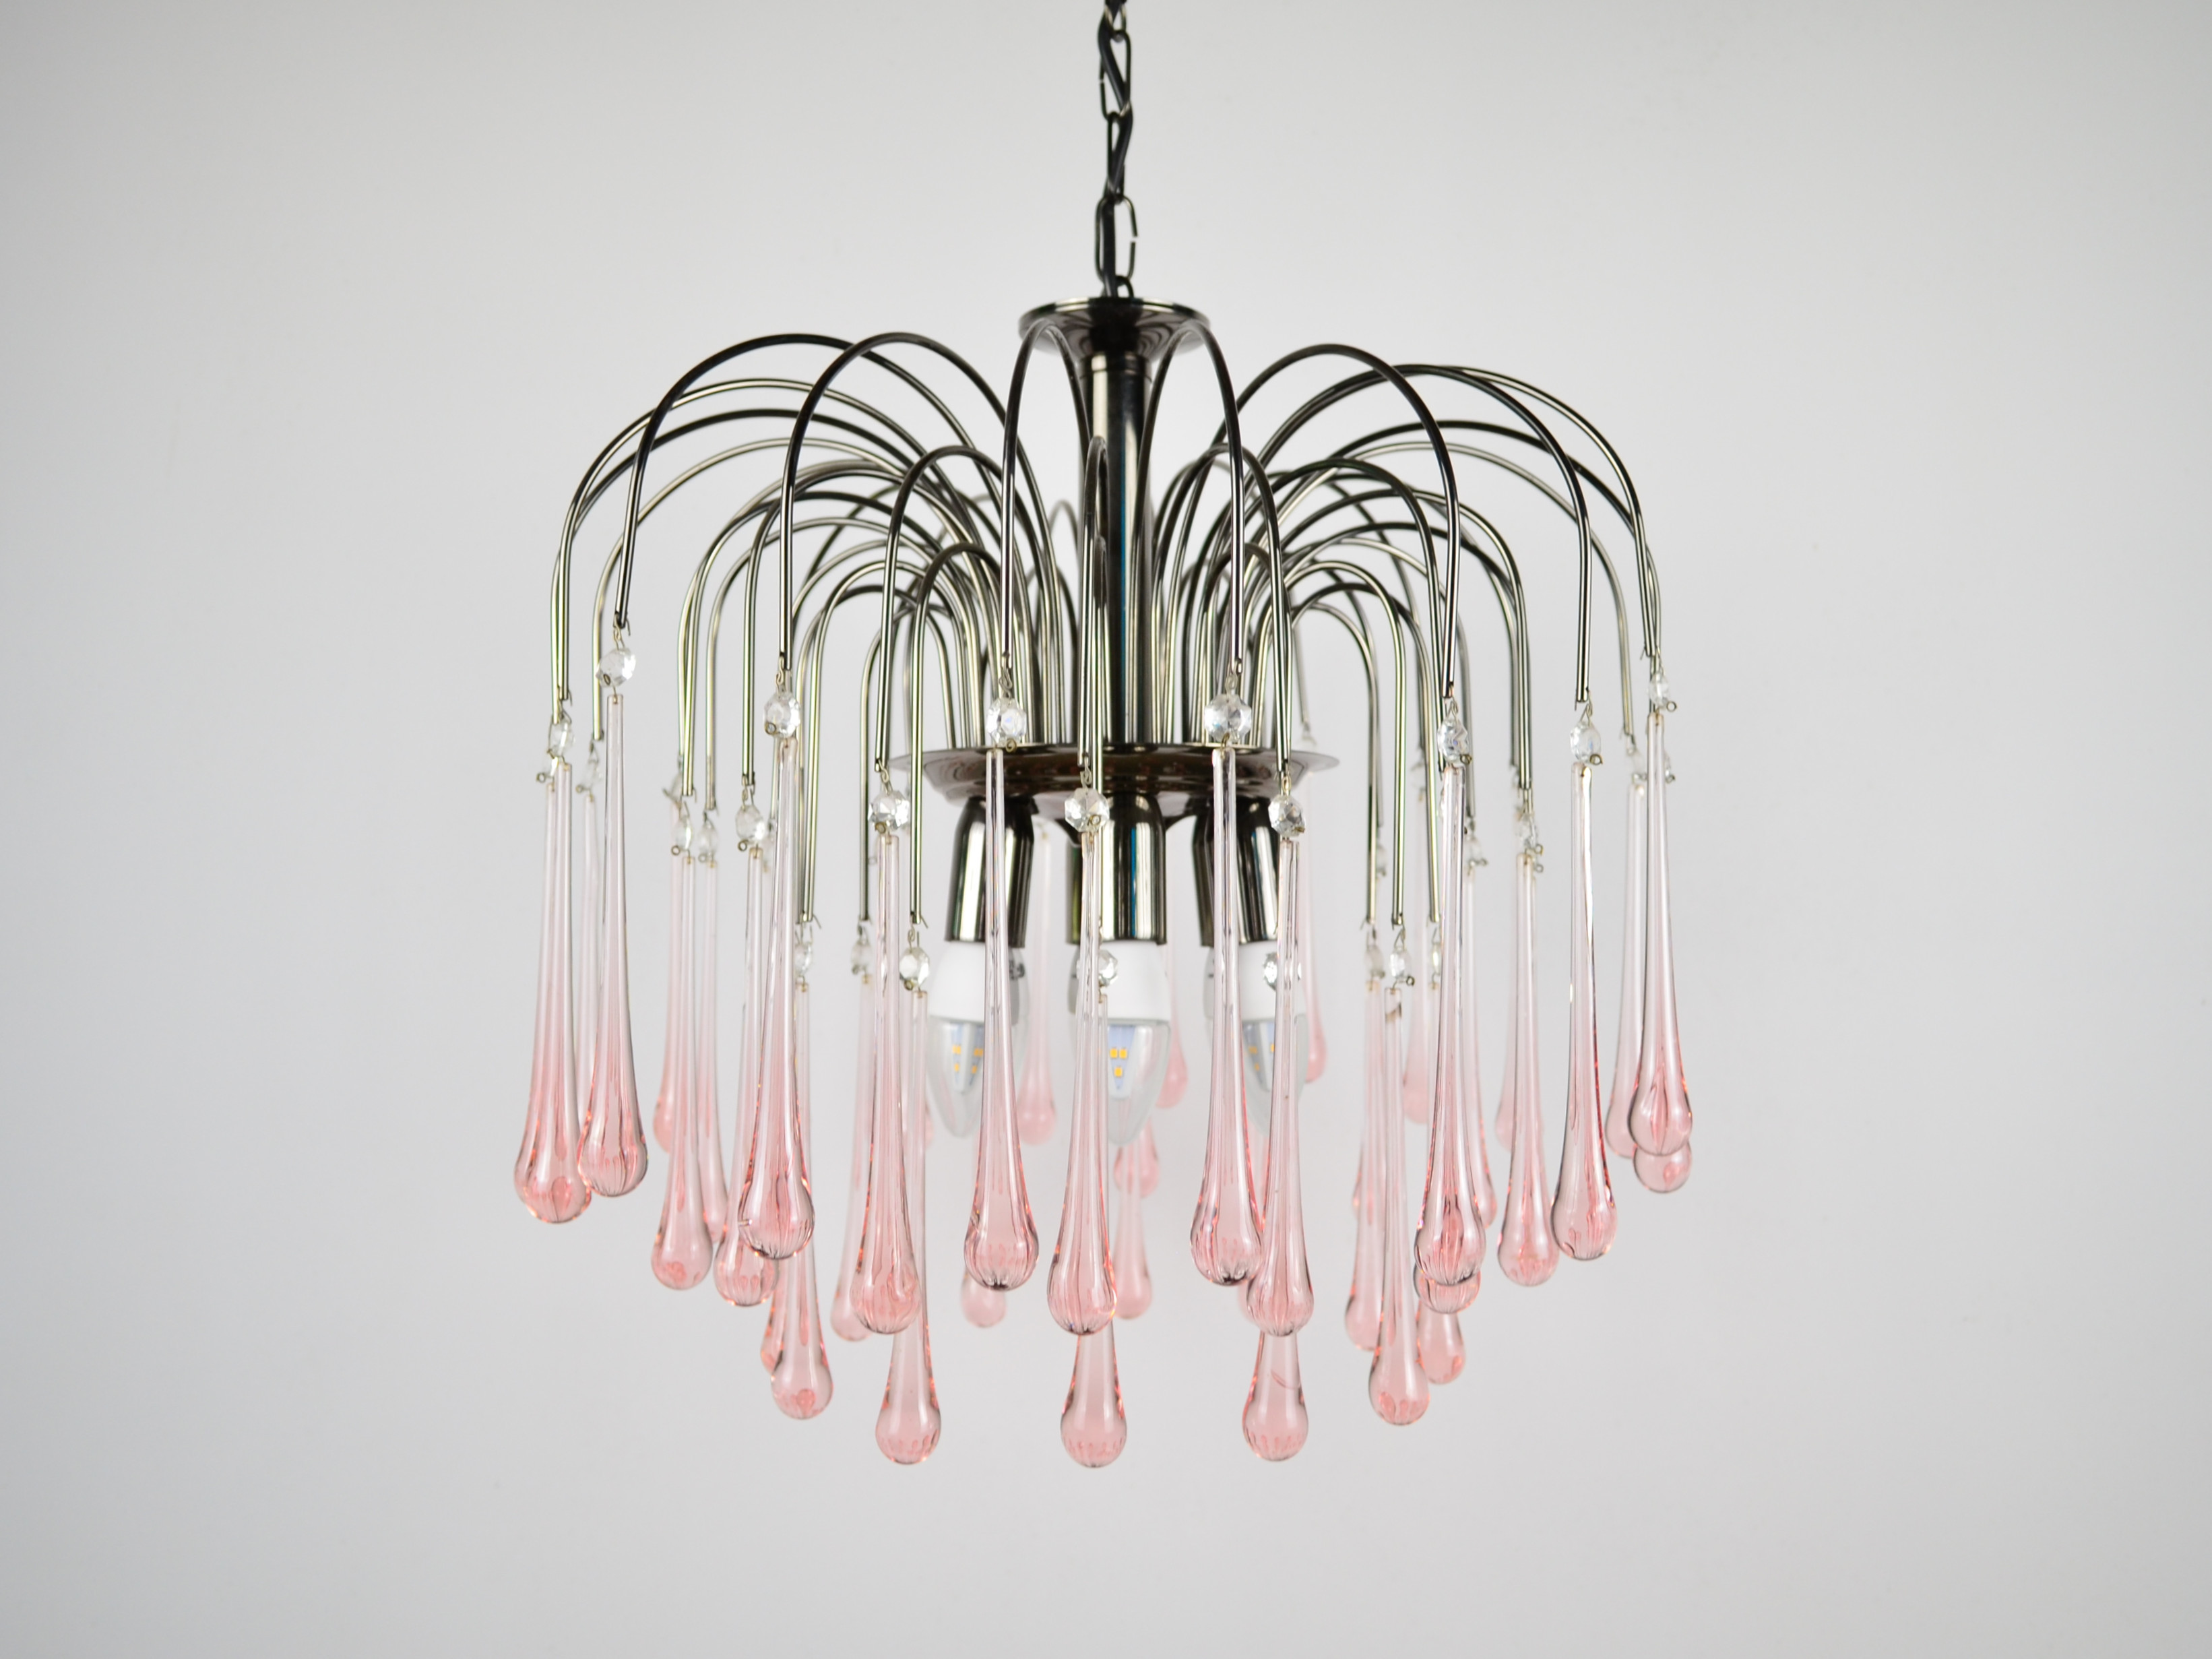 Murano Glass Chandelier by Paolo Venini